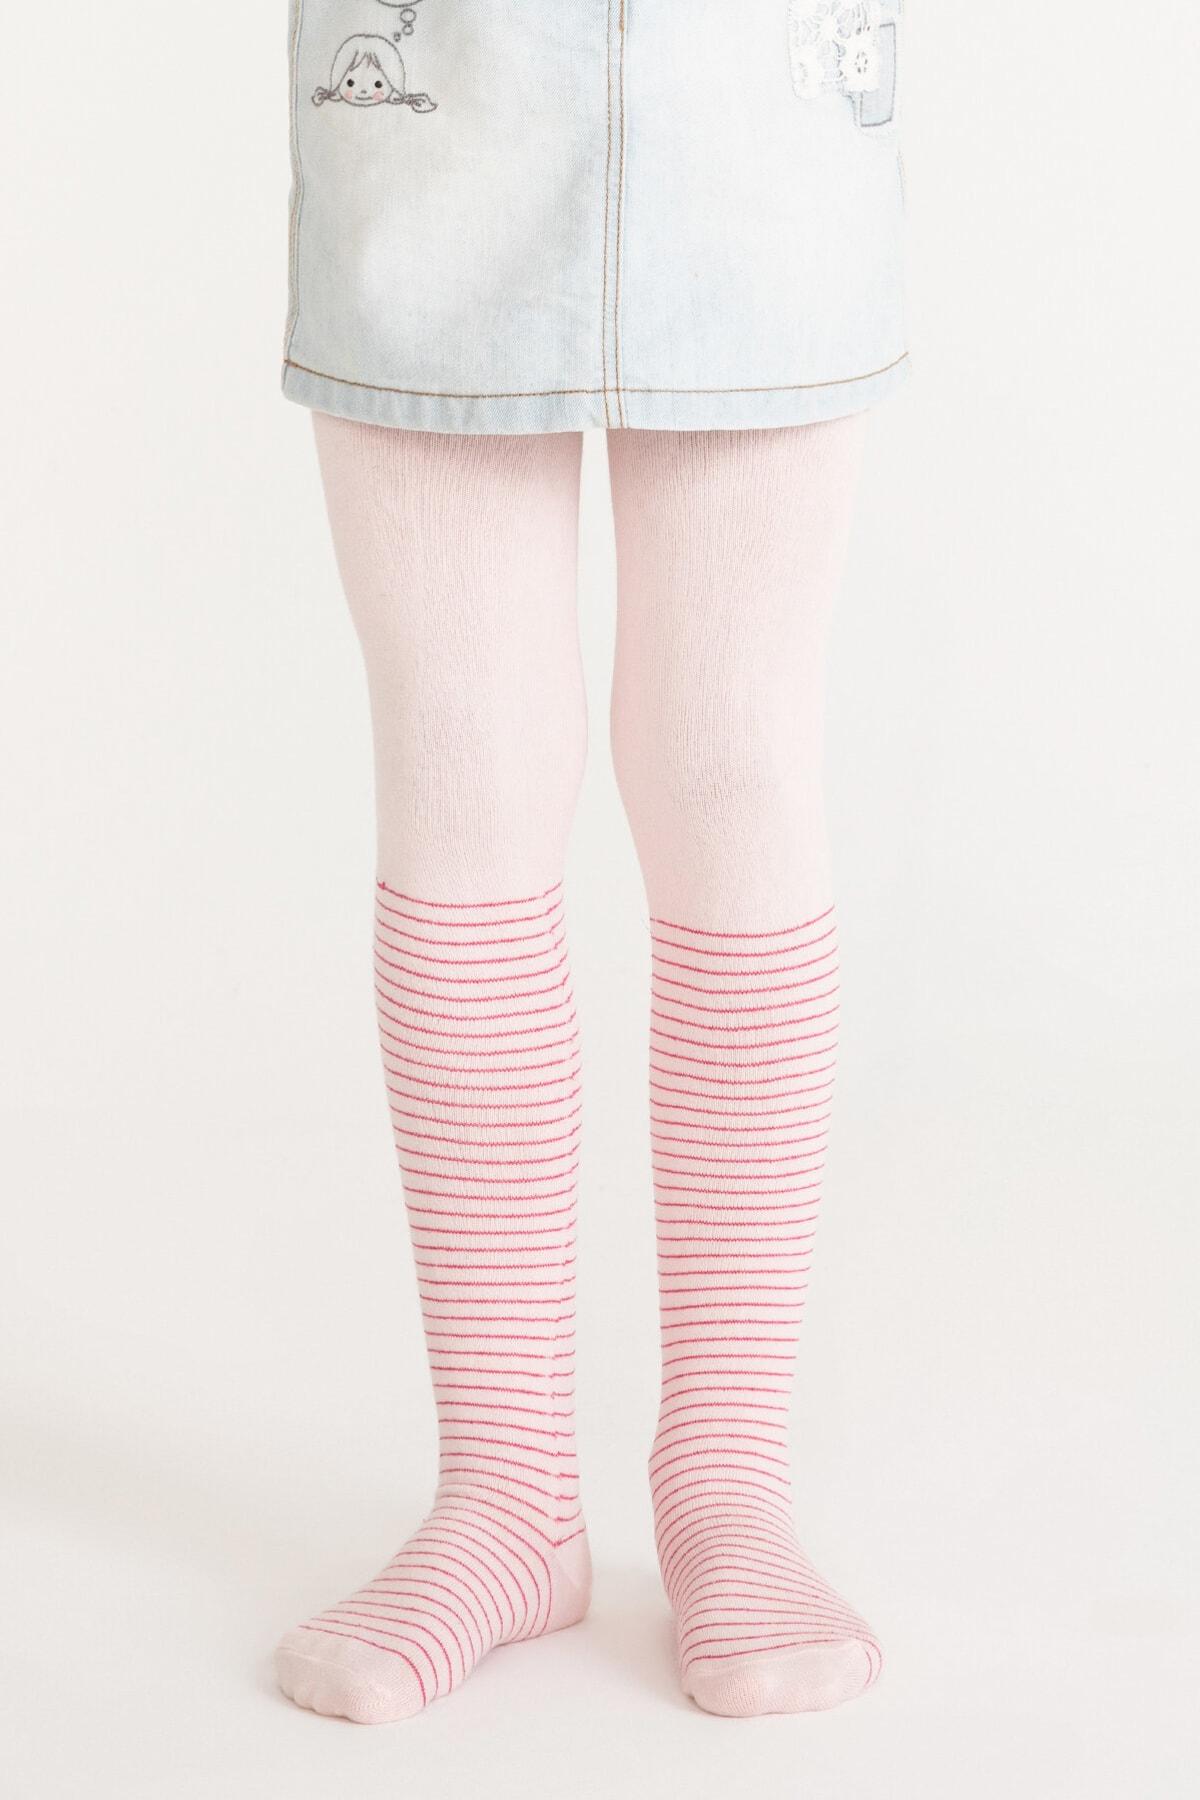 Penti Pembe Pretty Crystal Külotlu Çorap 1